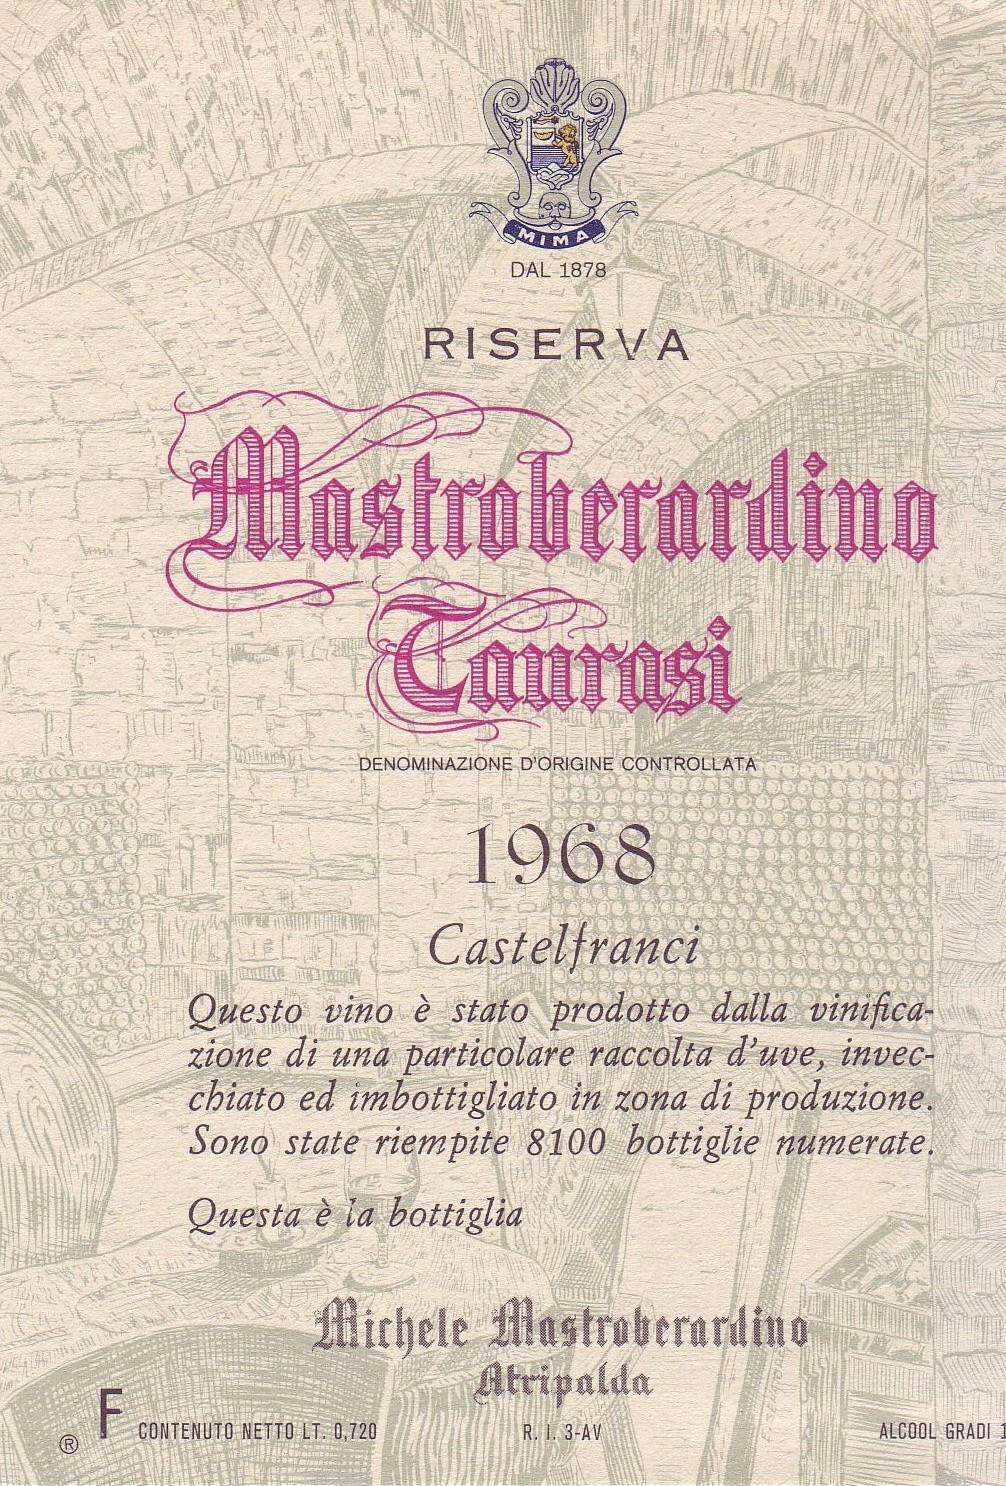 Antonio Mastroberardino's 1968 Taurasi